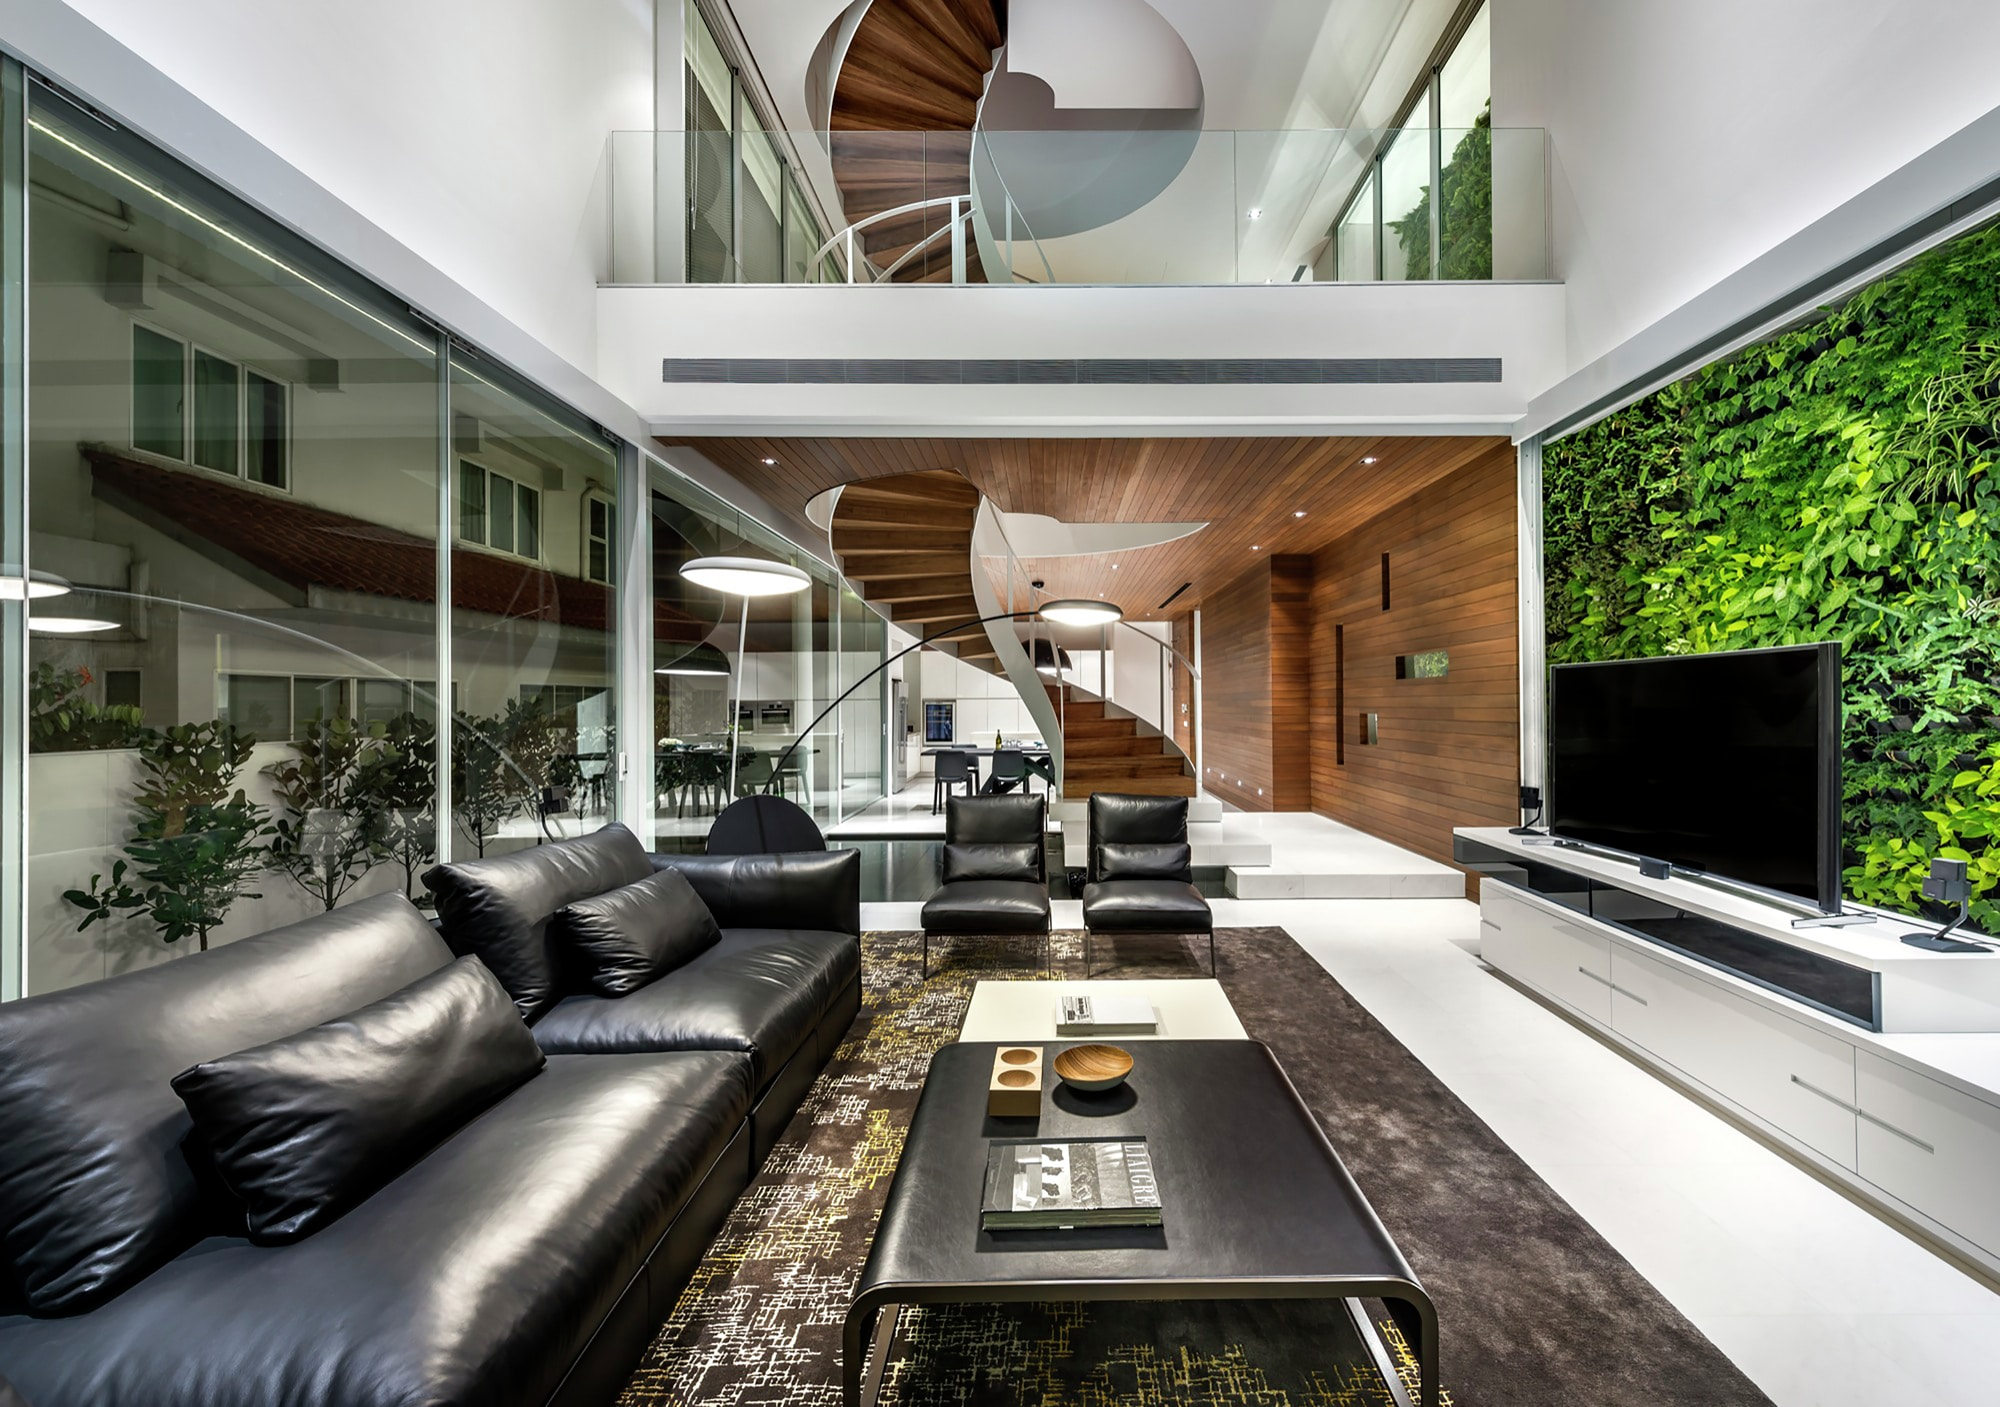 Casa moderna cuatro dormitorios construye hogar for Home design ideas 2016